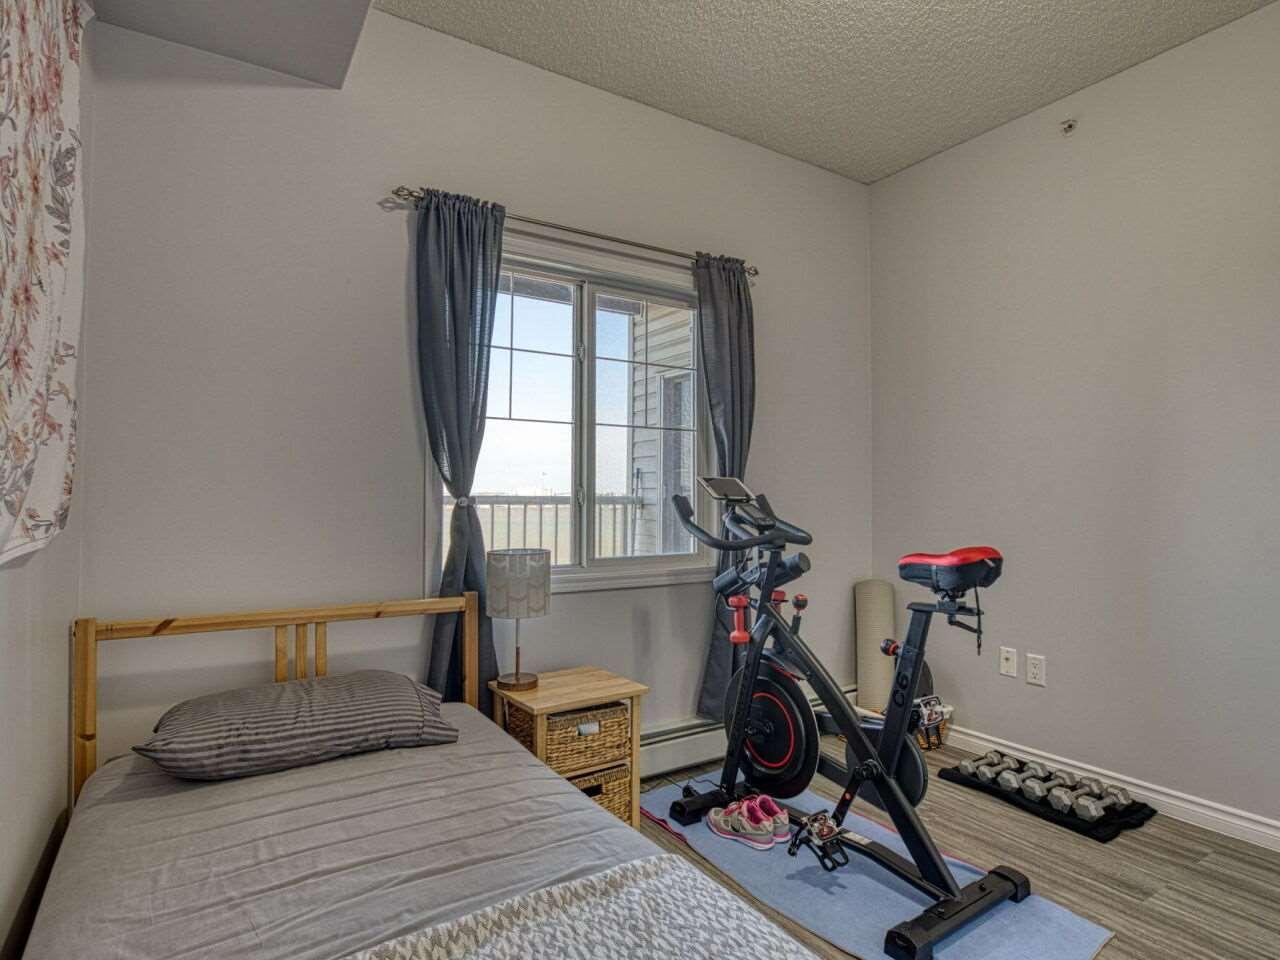 429 16807 100 Avenue - Glenwood_EDMO Lowrise Apartment for sale, 2 Bedrooms (E4234341) #16